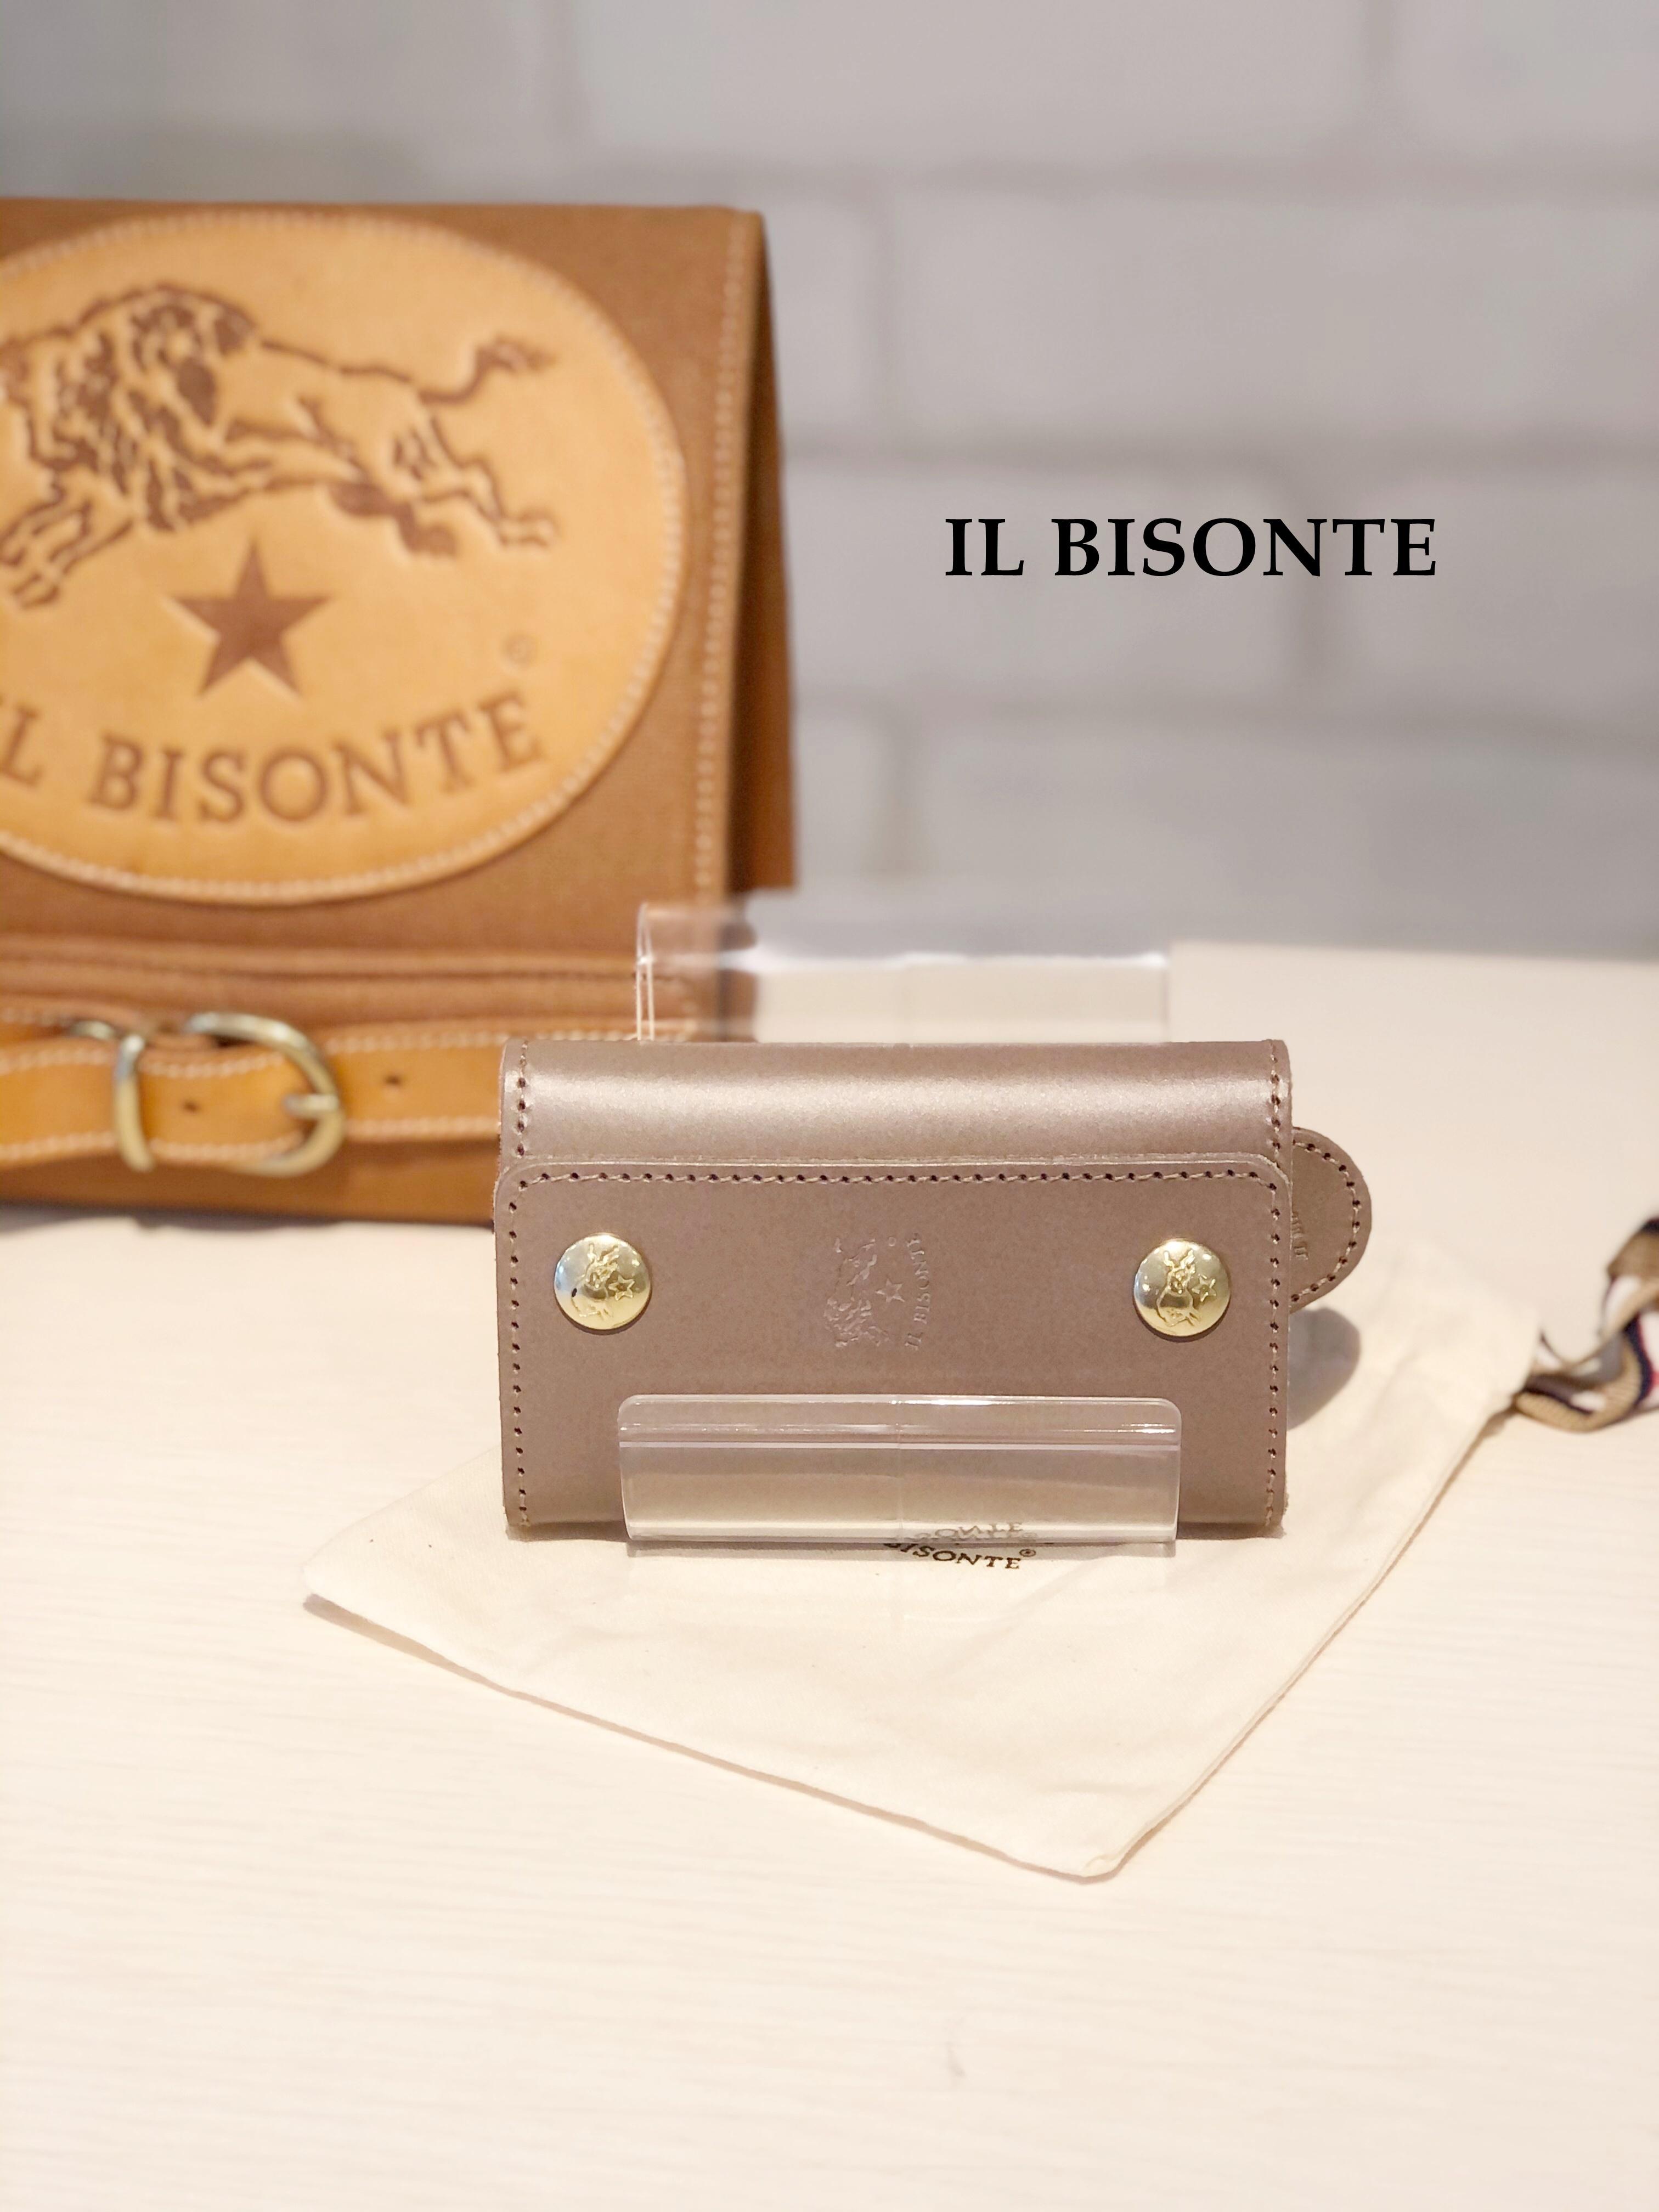 IL BISONTE(イルビゾンテ)/6連キーケース/9290(グレー)